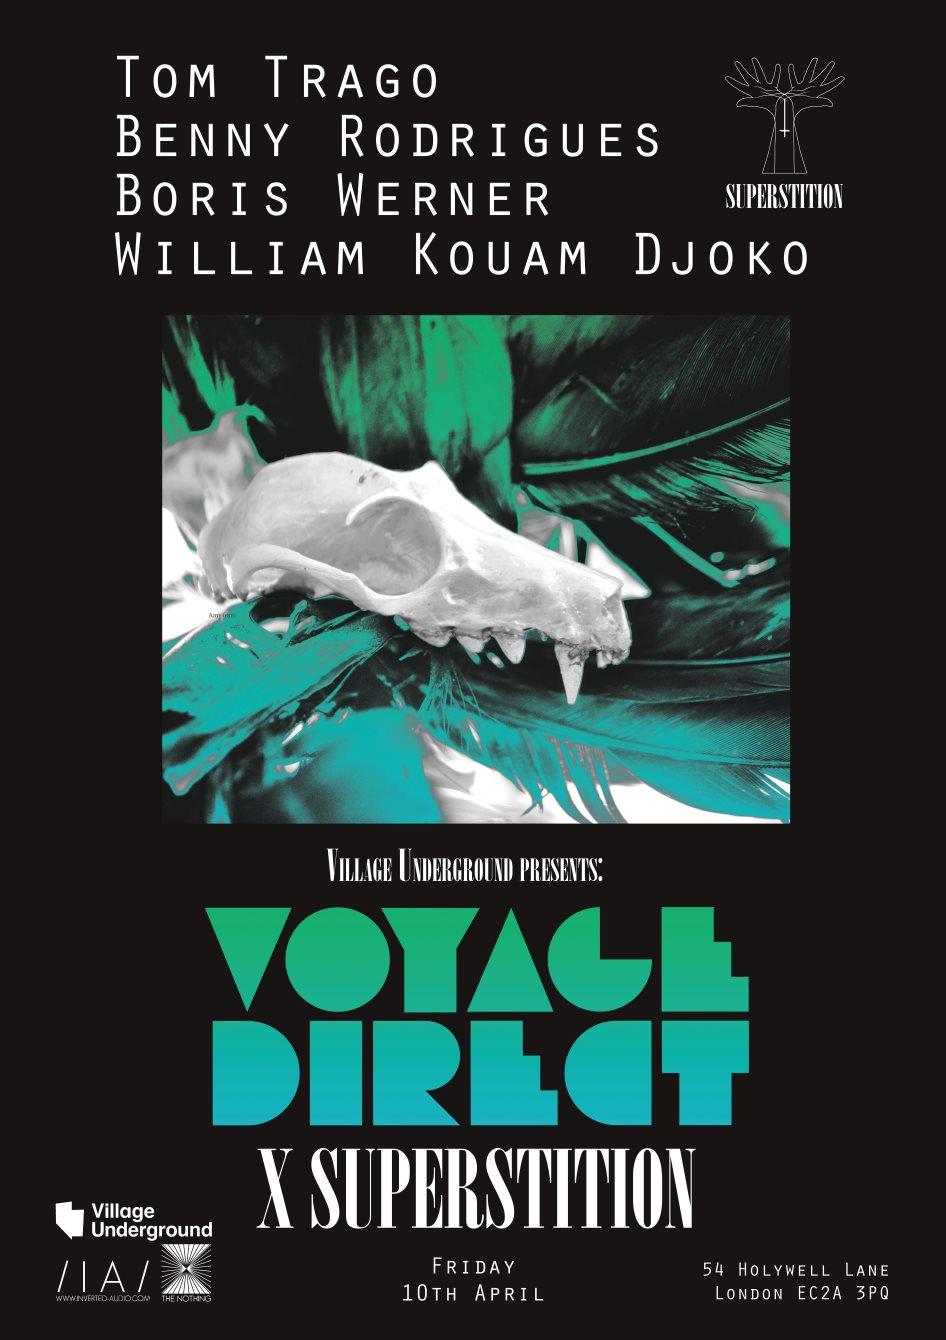 Superstition X Voyage Direct W/ Tom Trago, Benny Rodrigues, Boris Werner and William KJ - Flyer front